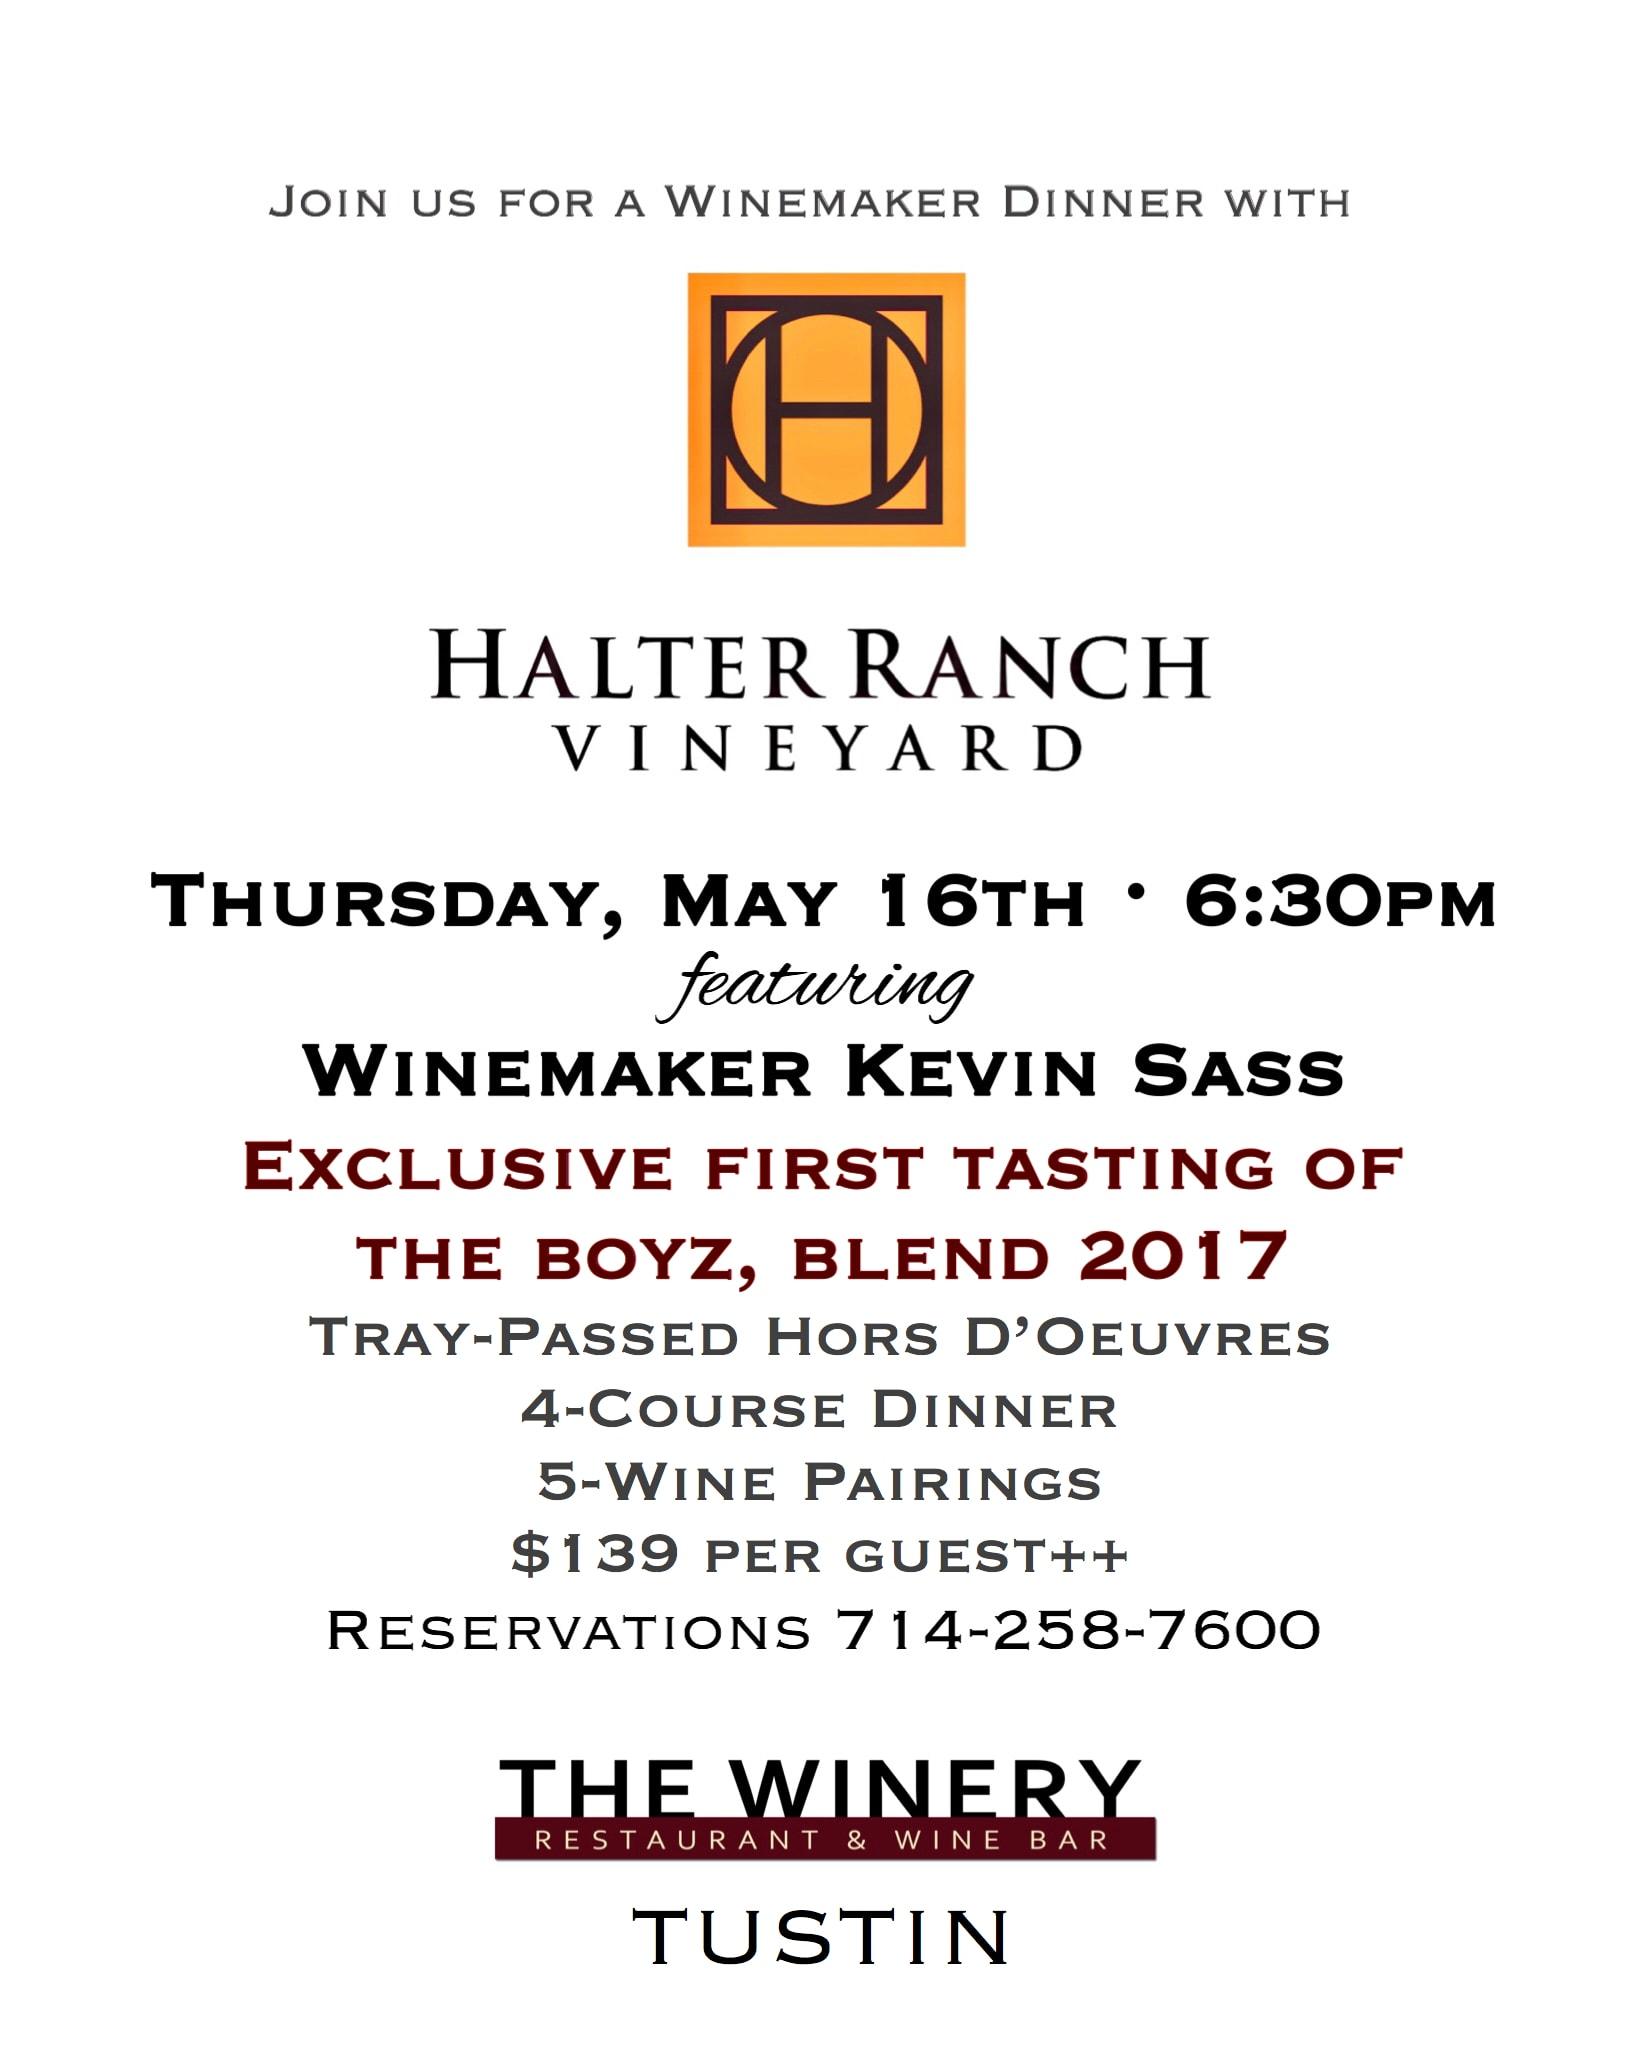 Halter Ranch Wine Dinner - Details Below